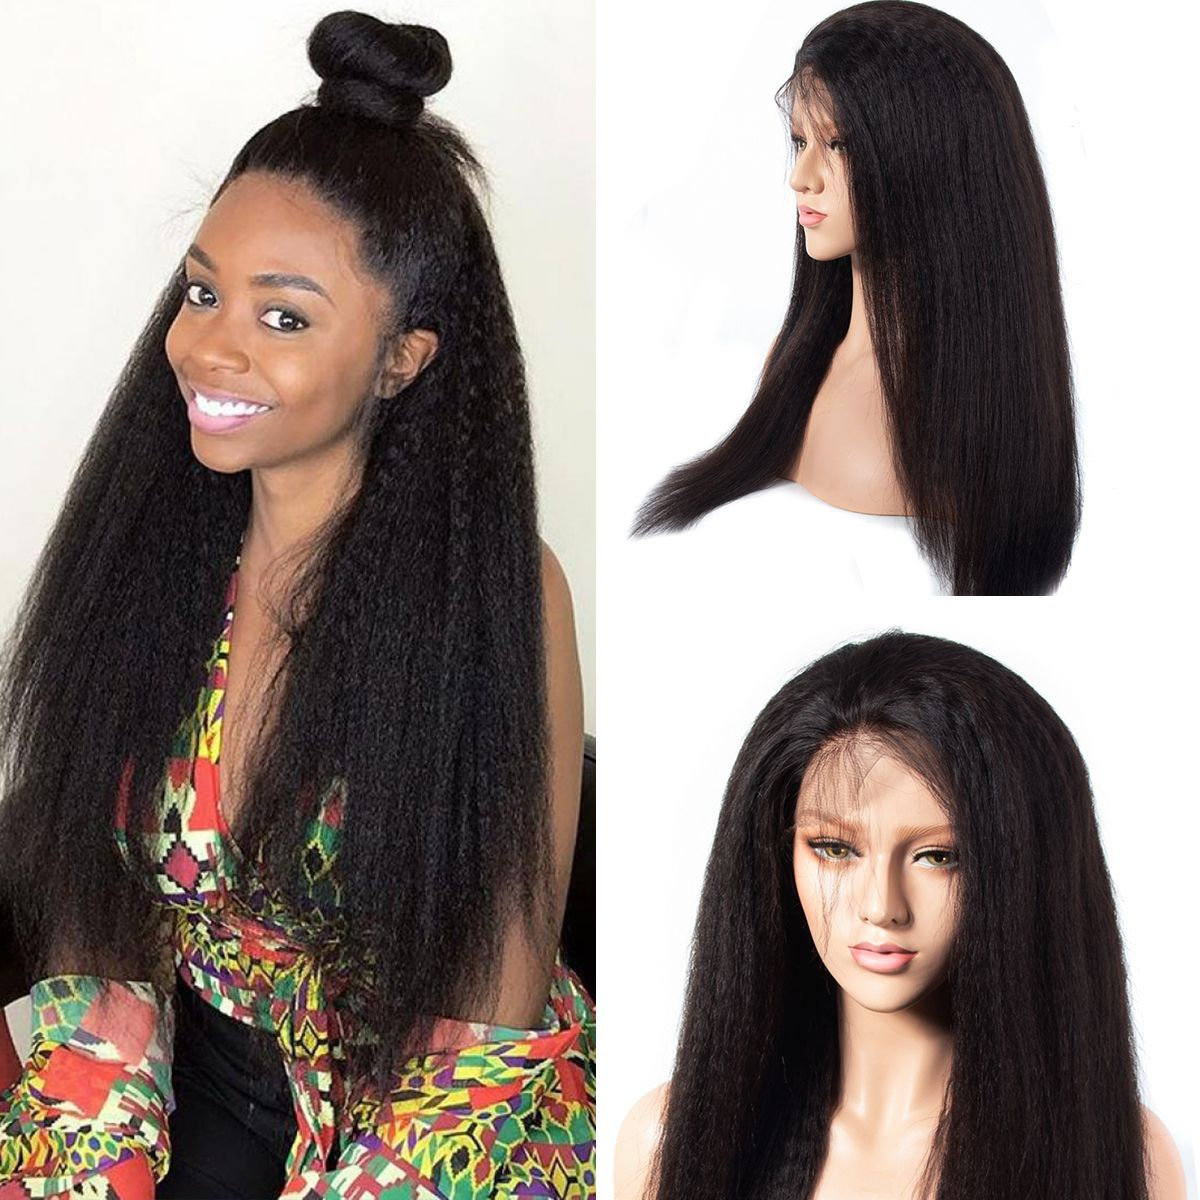 Kinky-straight-360-lace-wig